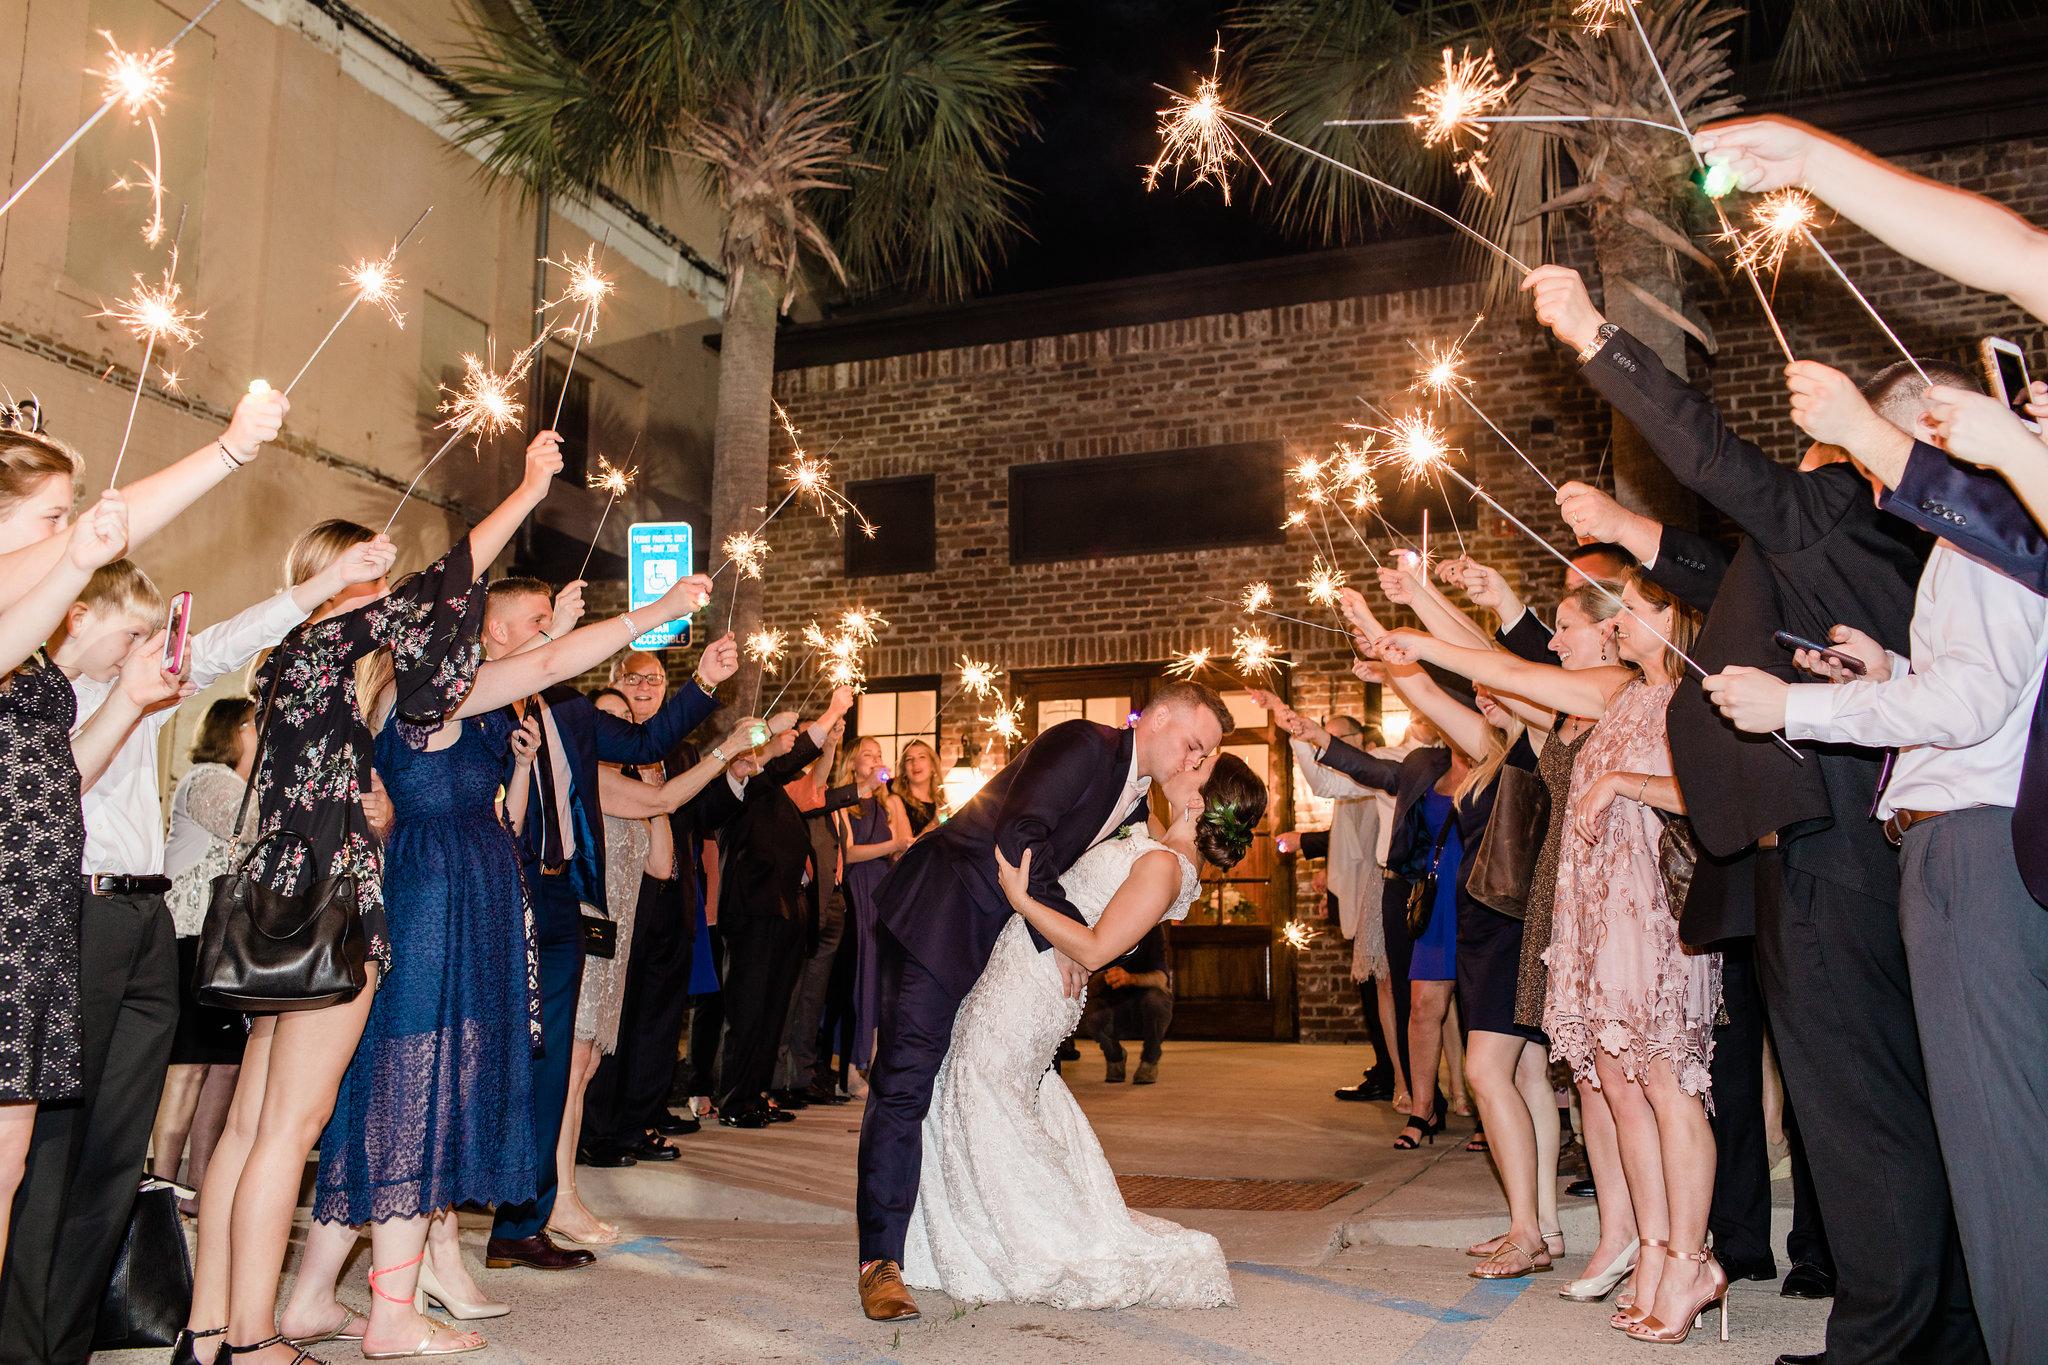 apt-b-photography-Savannah-wedding-photographer-savannah-engagement-photographer-historic-savannah-engagement-charles-h-morris-center-wedding-savannah-weddings-51.JPG